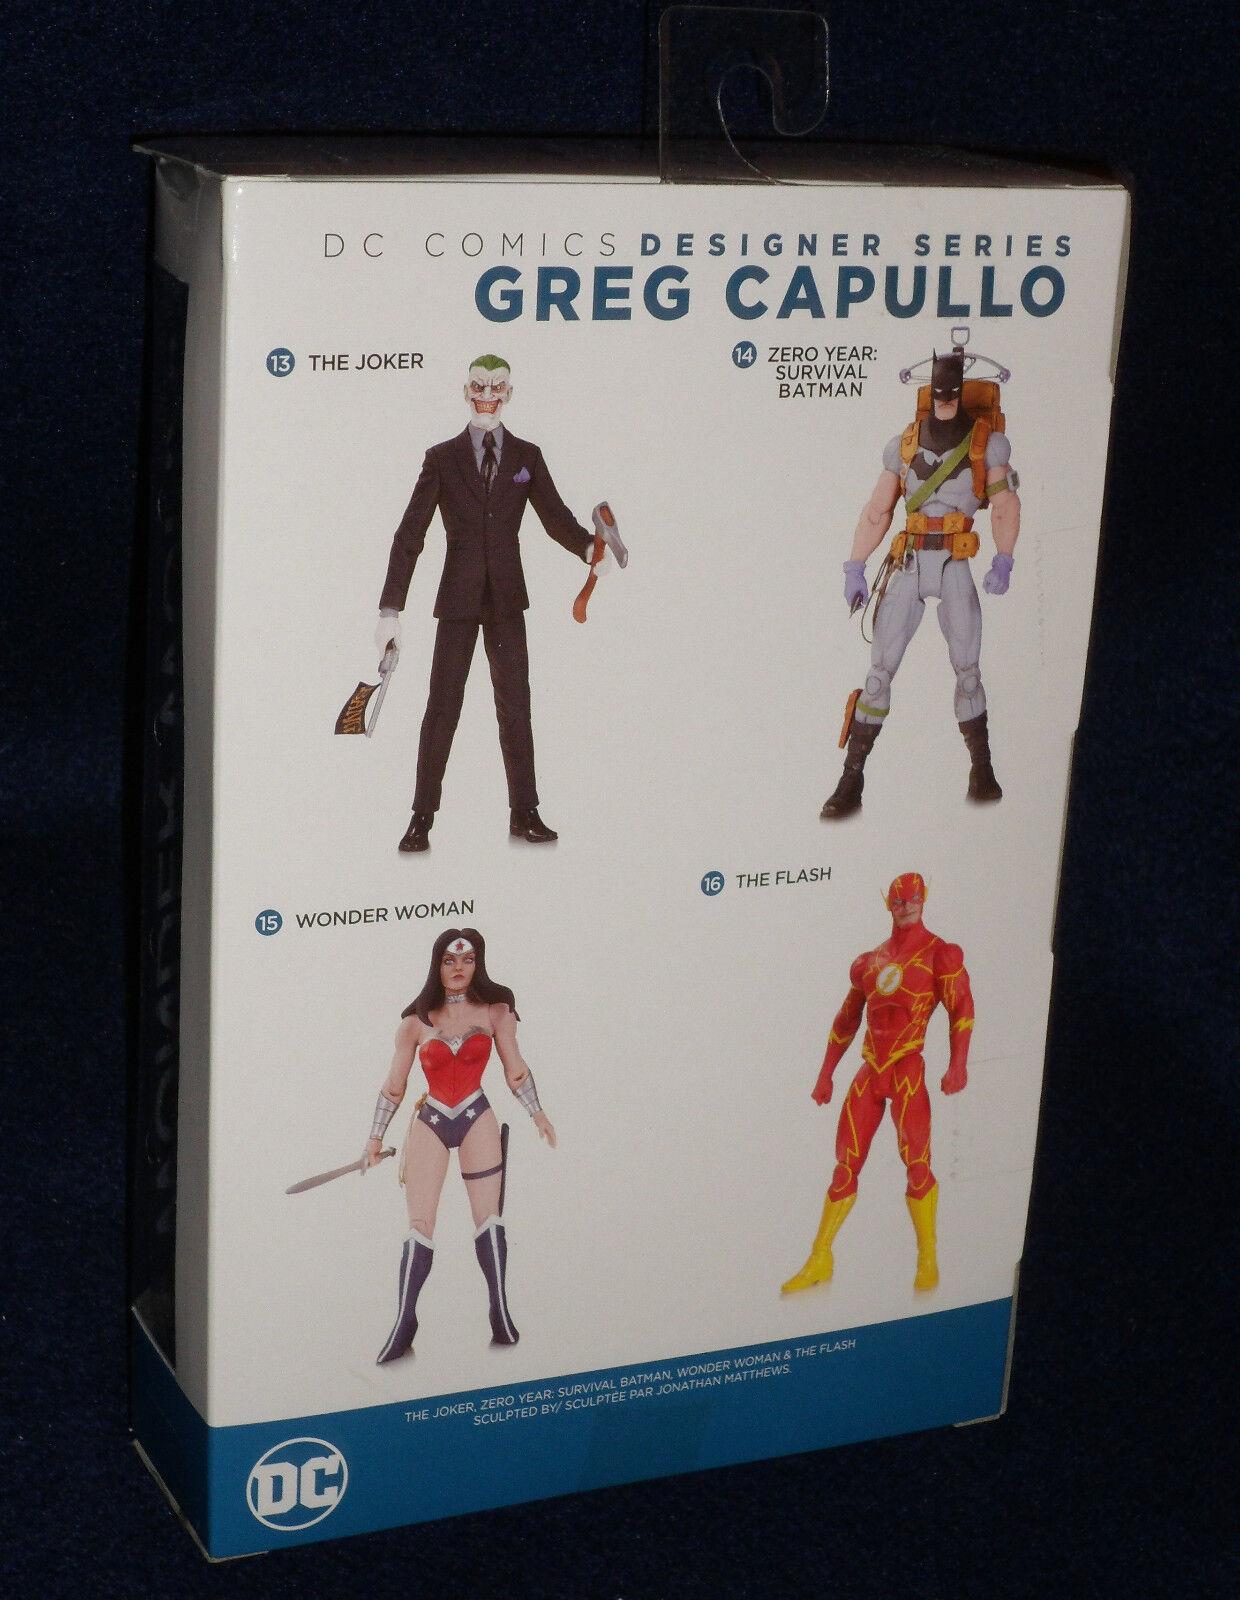 Dc comics serie designer greg capullo serie comics wonder woman actionfigur neuen 52 direkte f6cb1f